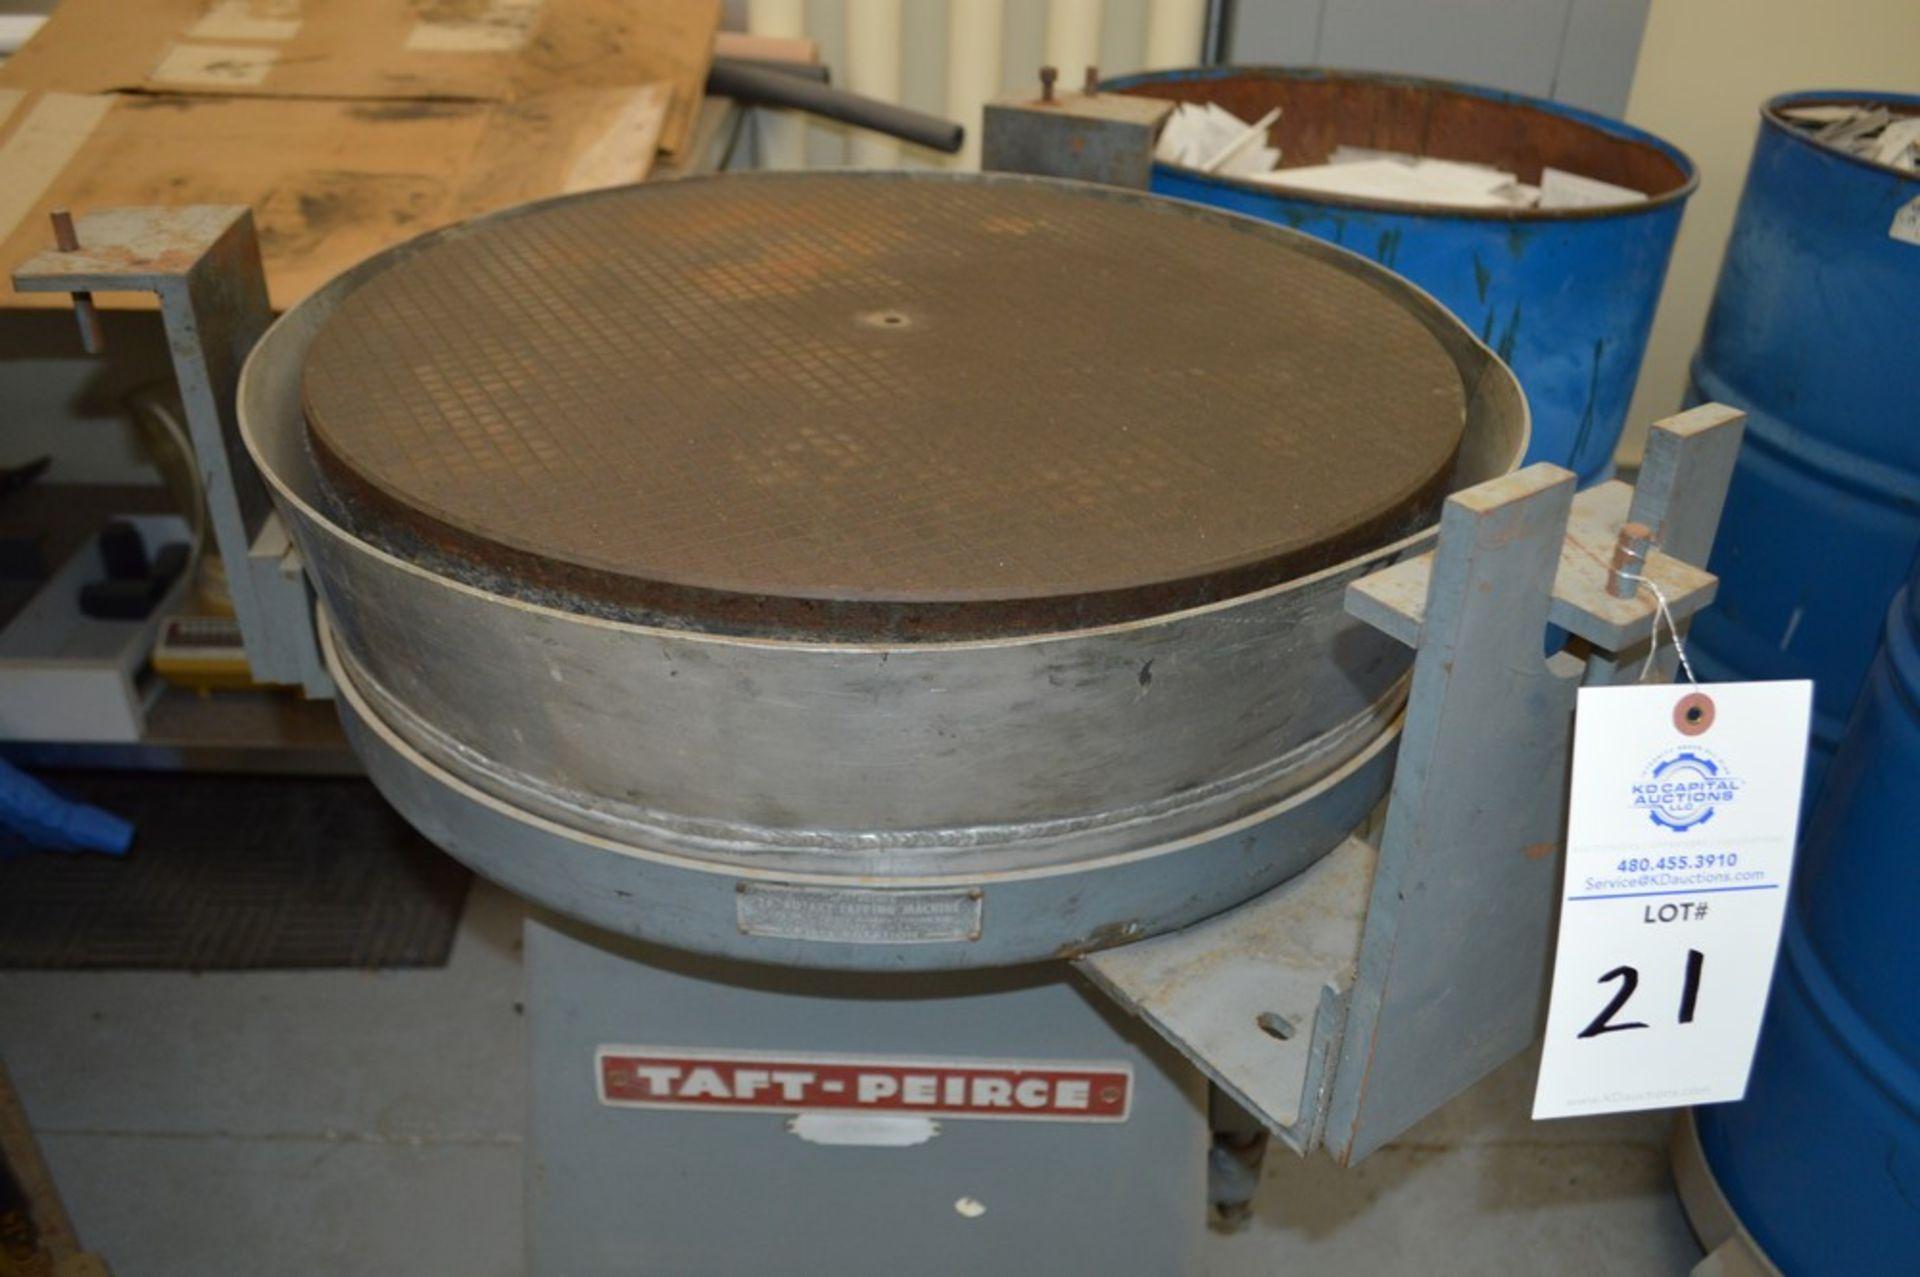 "Taft-Peirce 24"" Rotary Lapping machine S/N 217 - Image 2 of 4"